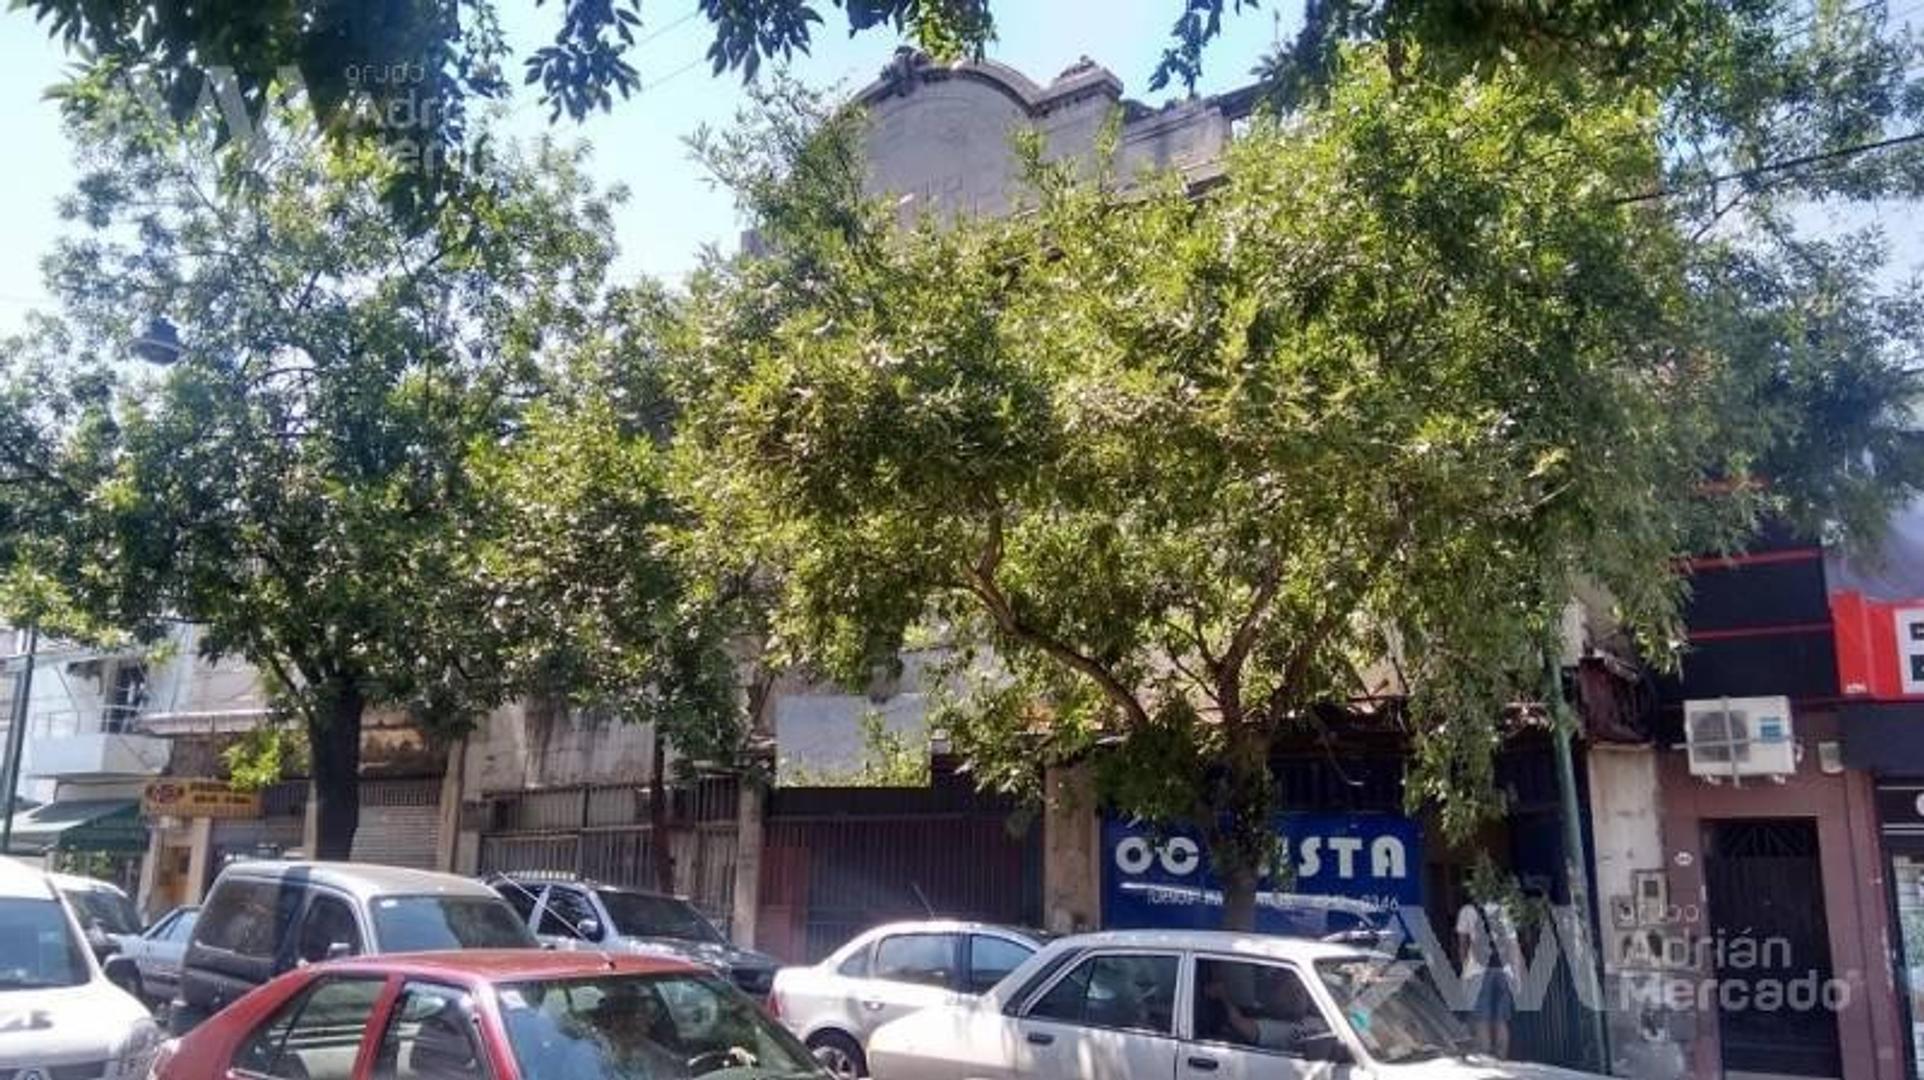 Local Sobre Terreno Propio Ideal para Garaje, Gimnasio, Mercado, etc.   Pompeya